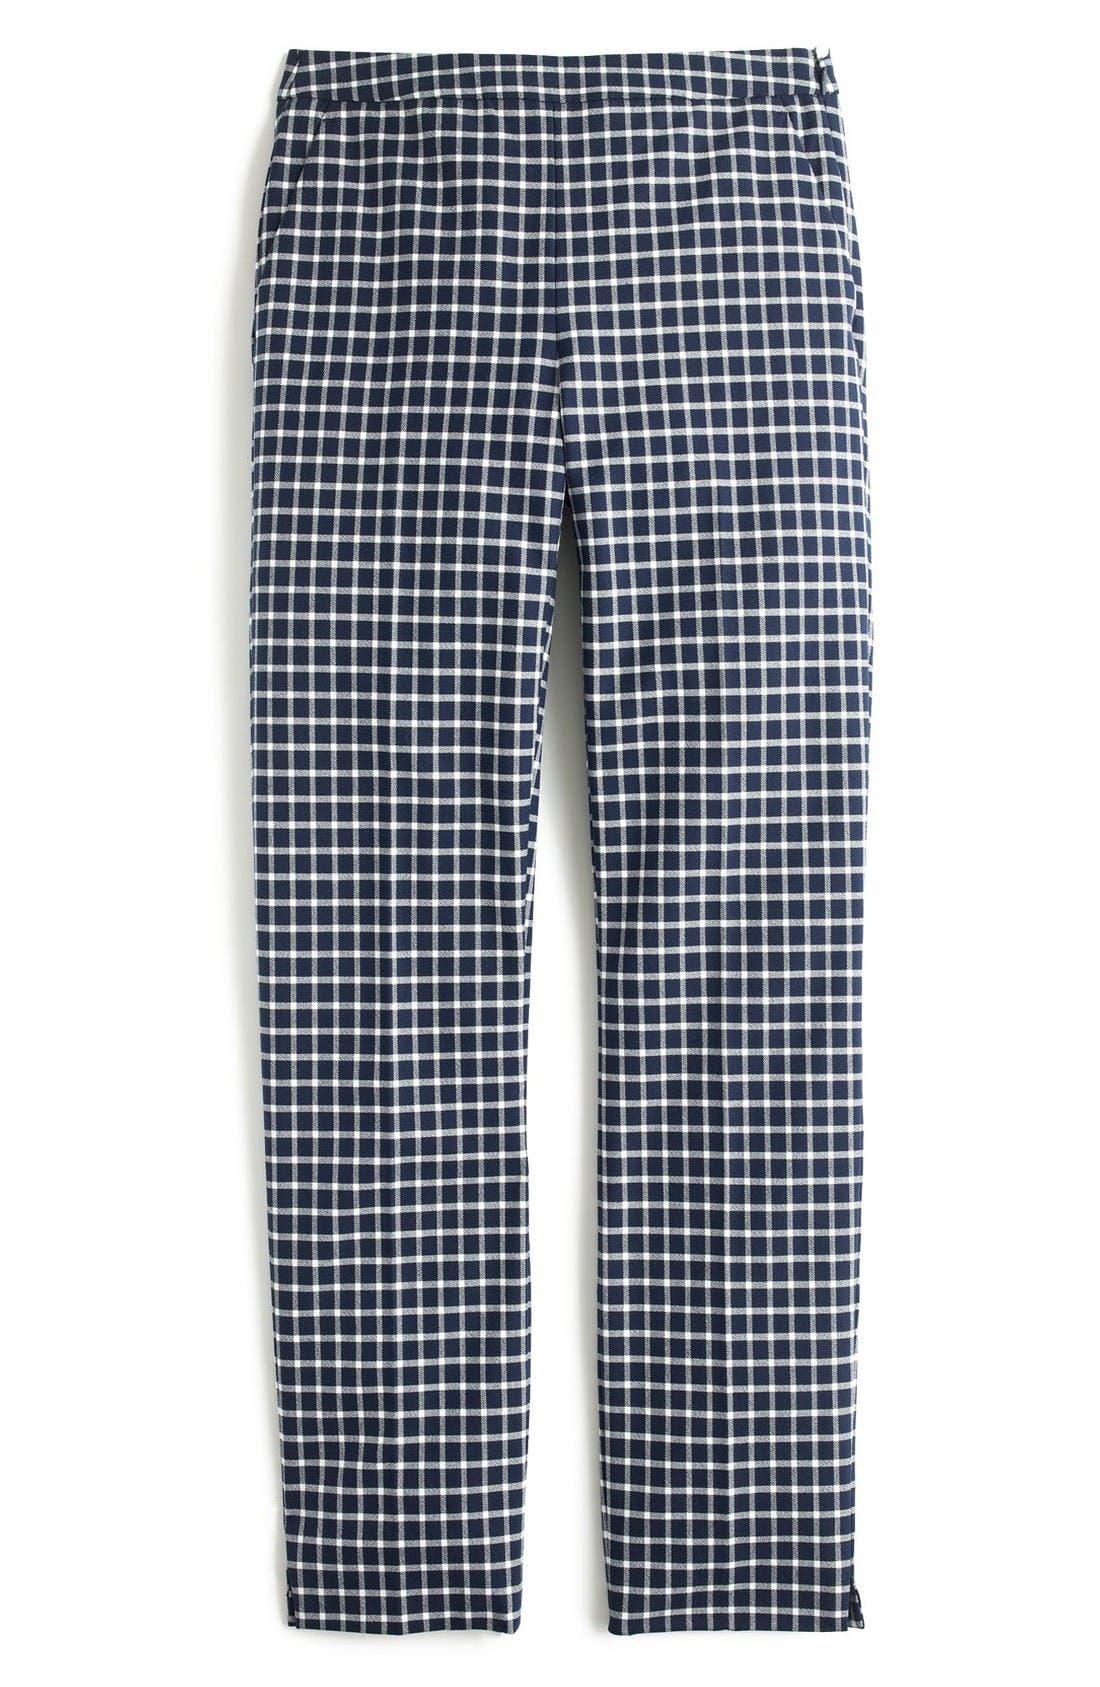 Alternate Image 3  - J.Crew Martie Windowpane Print Pants (Regular & Petite)